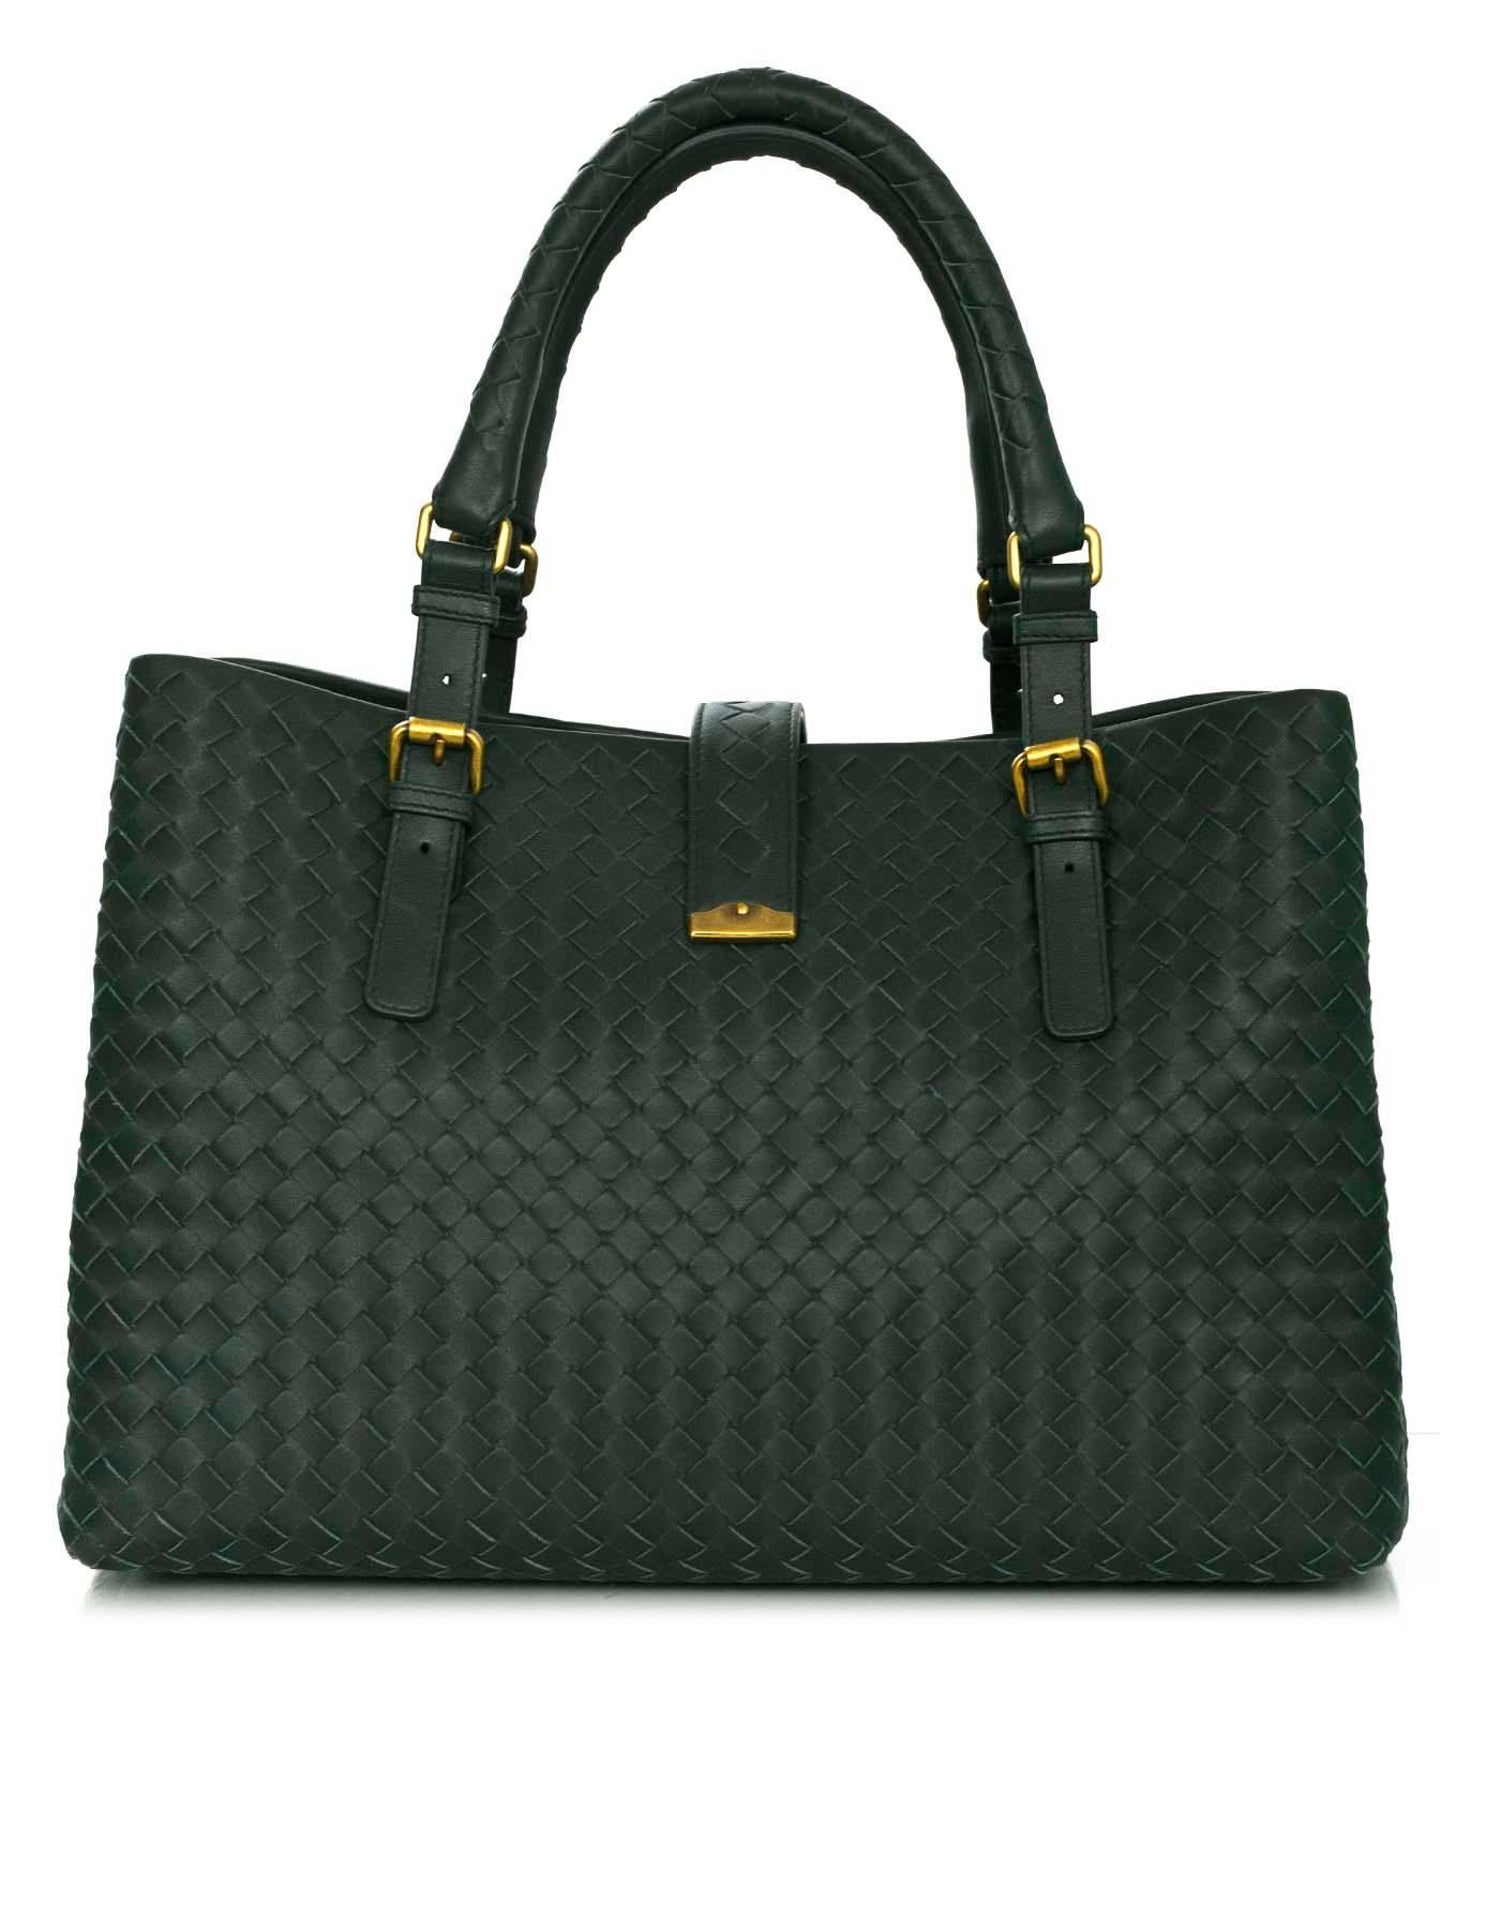 a39f37d005 Bottega Veneta Green Intrecciato Woven Leather Roma Tote Bag For Sale at  1stdibs